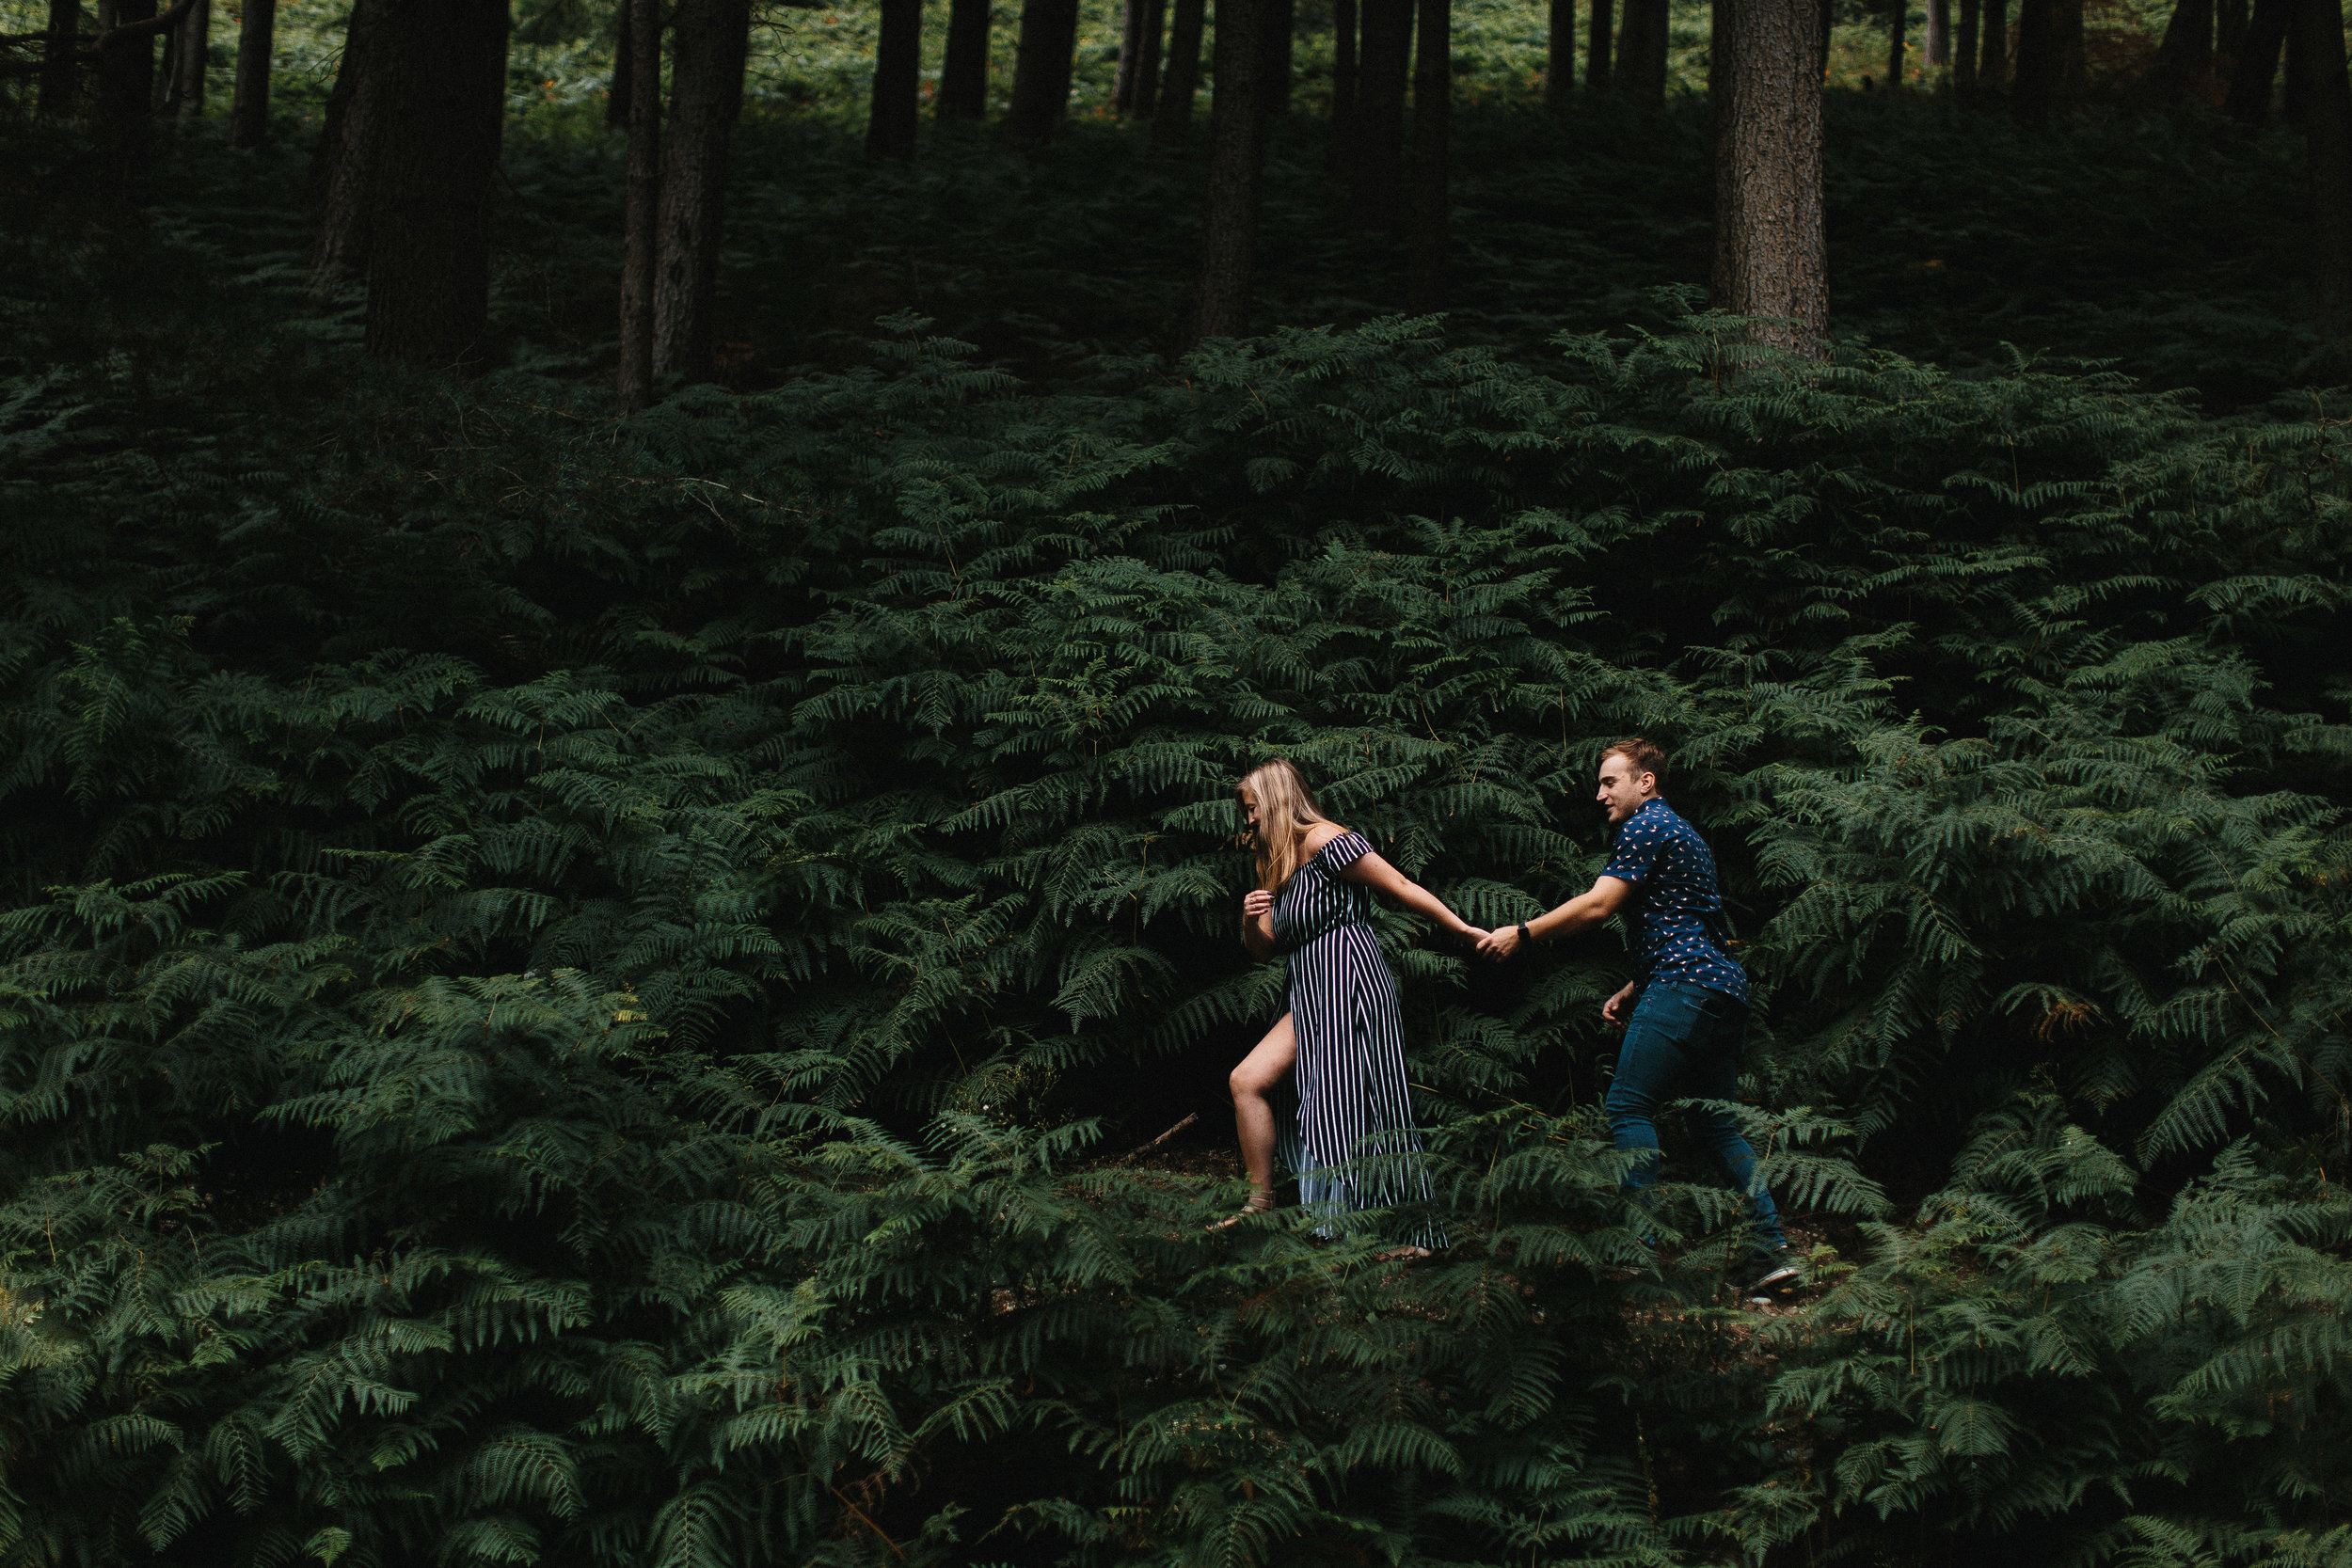 ireland_county_wicklow_glendalough_engagement_adventure_photography_windy_moody_atlanta_wedding_photographer_1264.jpg